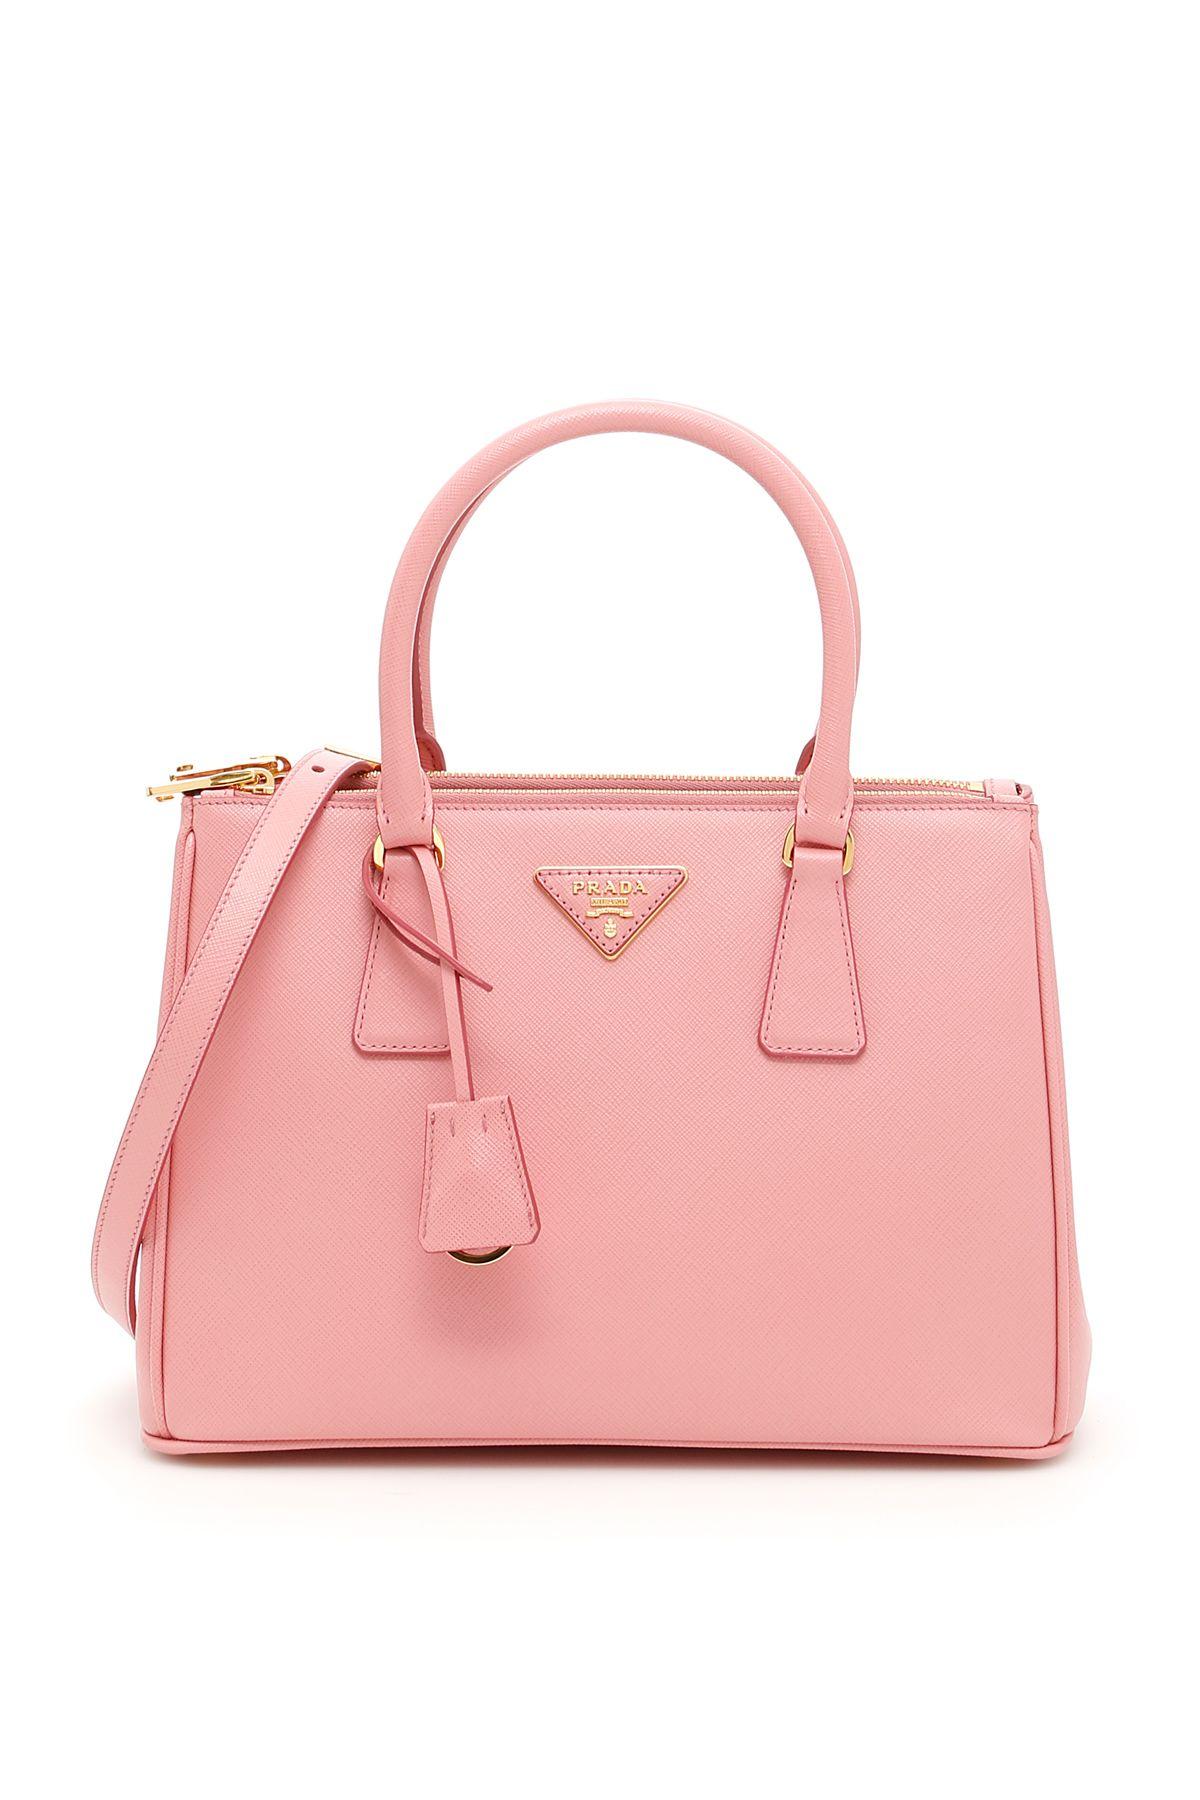 8879d53dcee2 Prada Saffiano Lux Galleria Bag In Petalo